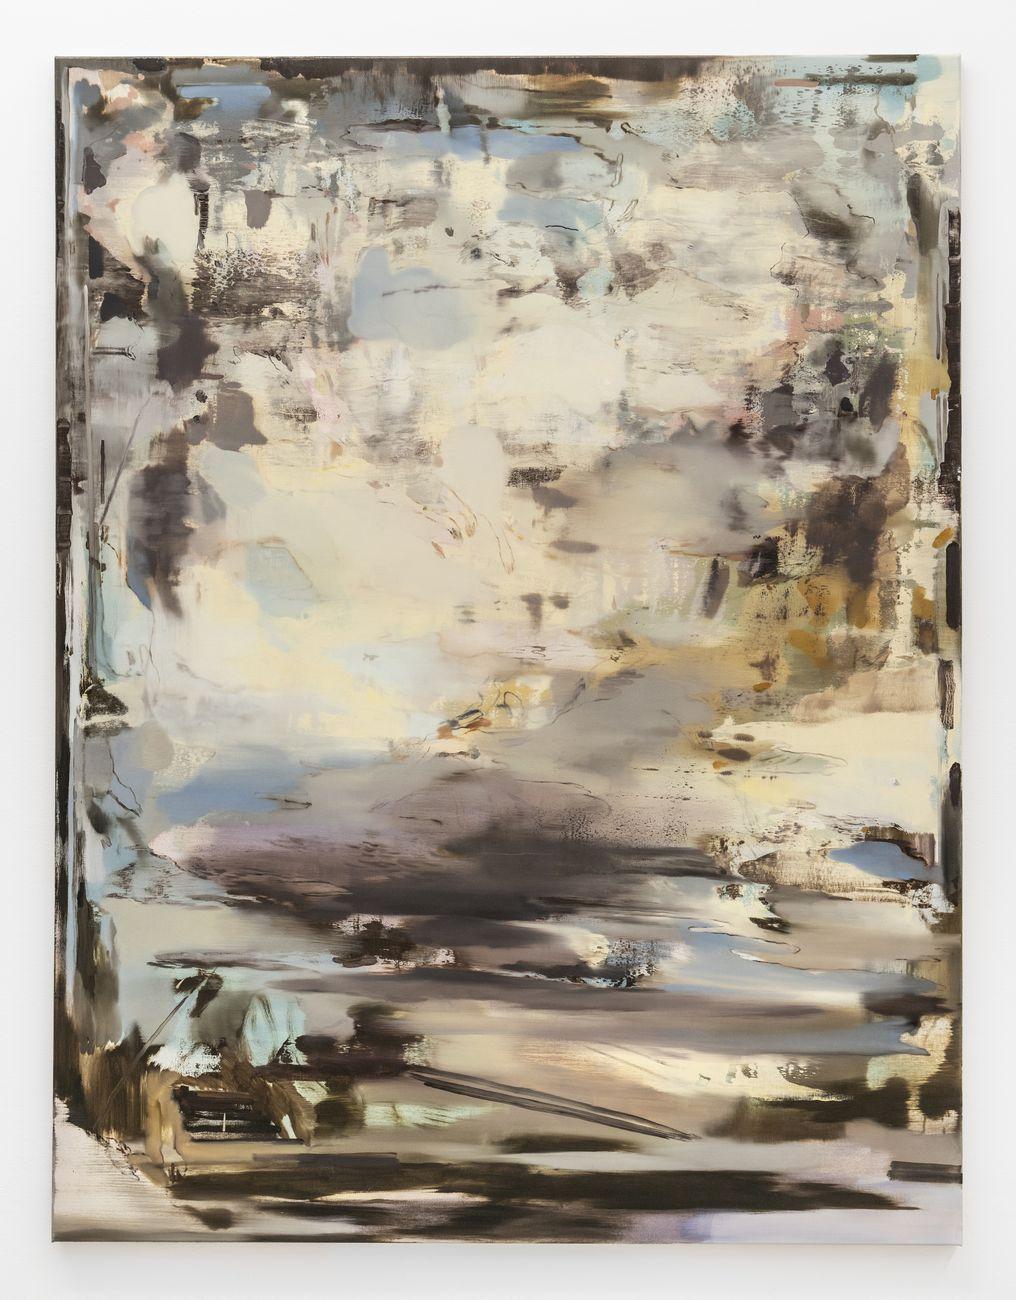 Nazzarena Poli Maramotti, Enza, 2019, tecnica mista su tela, 170x130 cm. Photo credit Masiar Pasquali